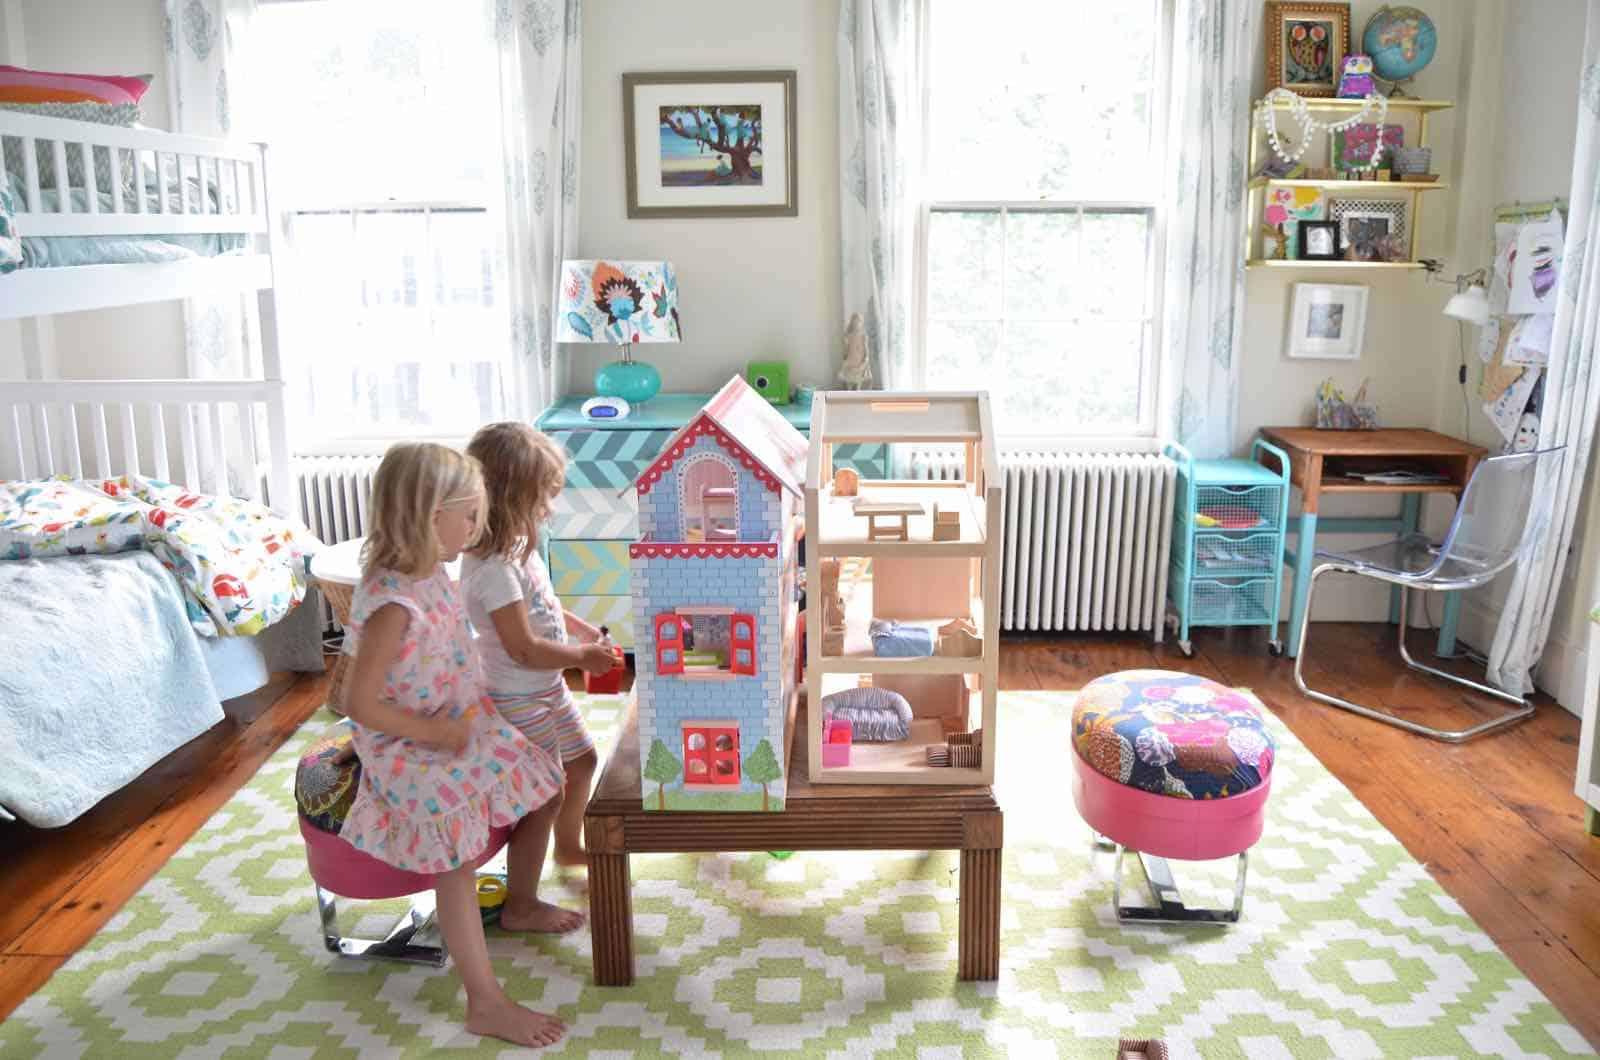 doll houses in girls room